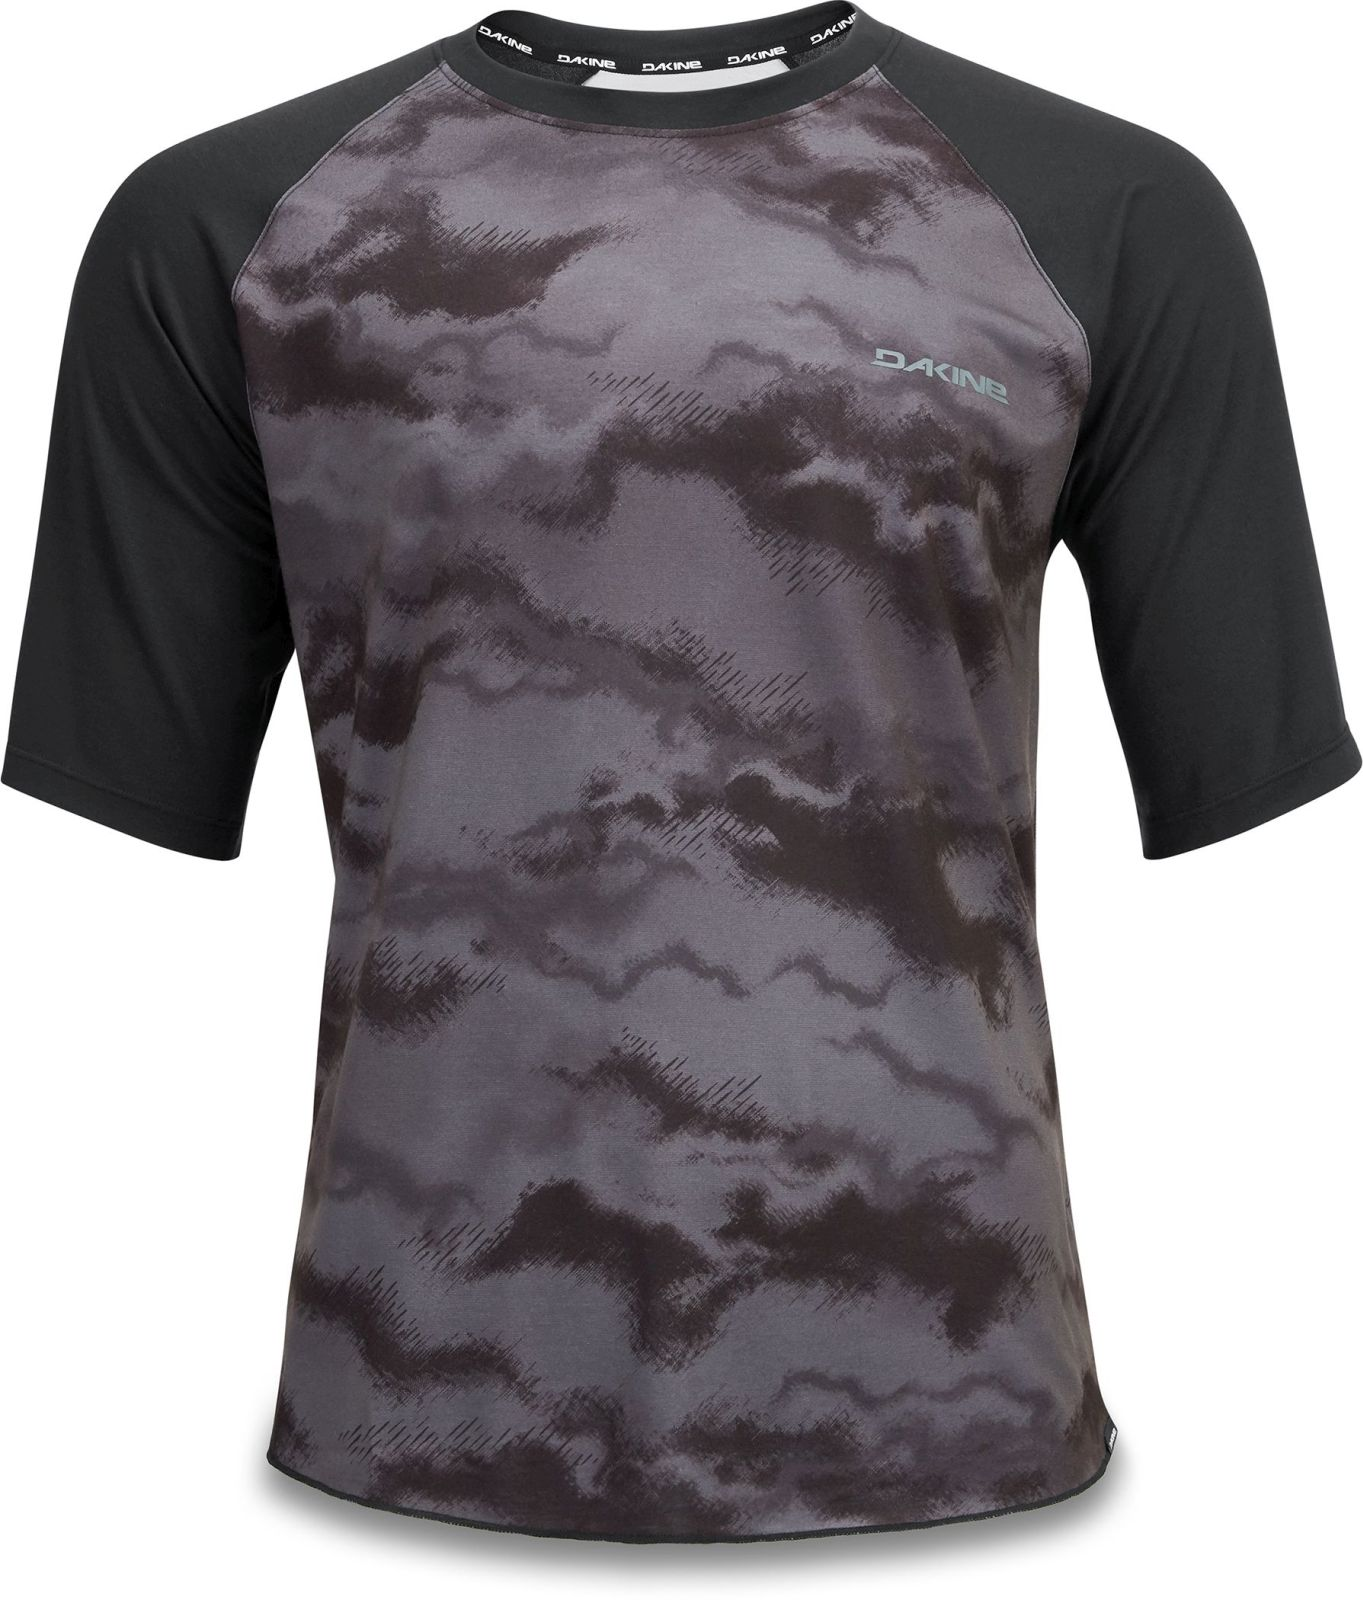 Dakine Dropout S/S Jersey - black/dark ashcroft XL